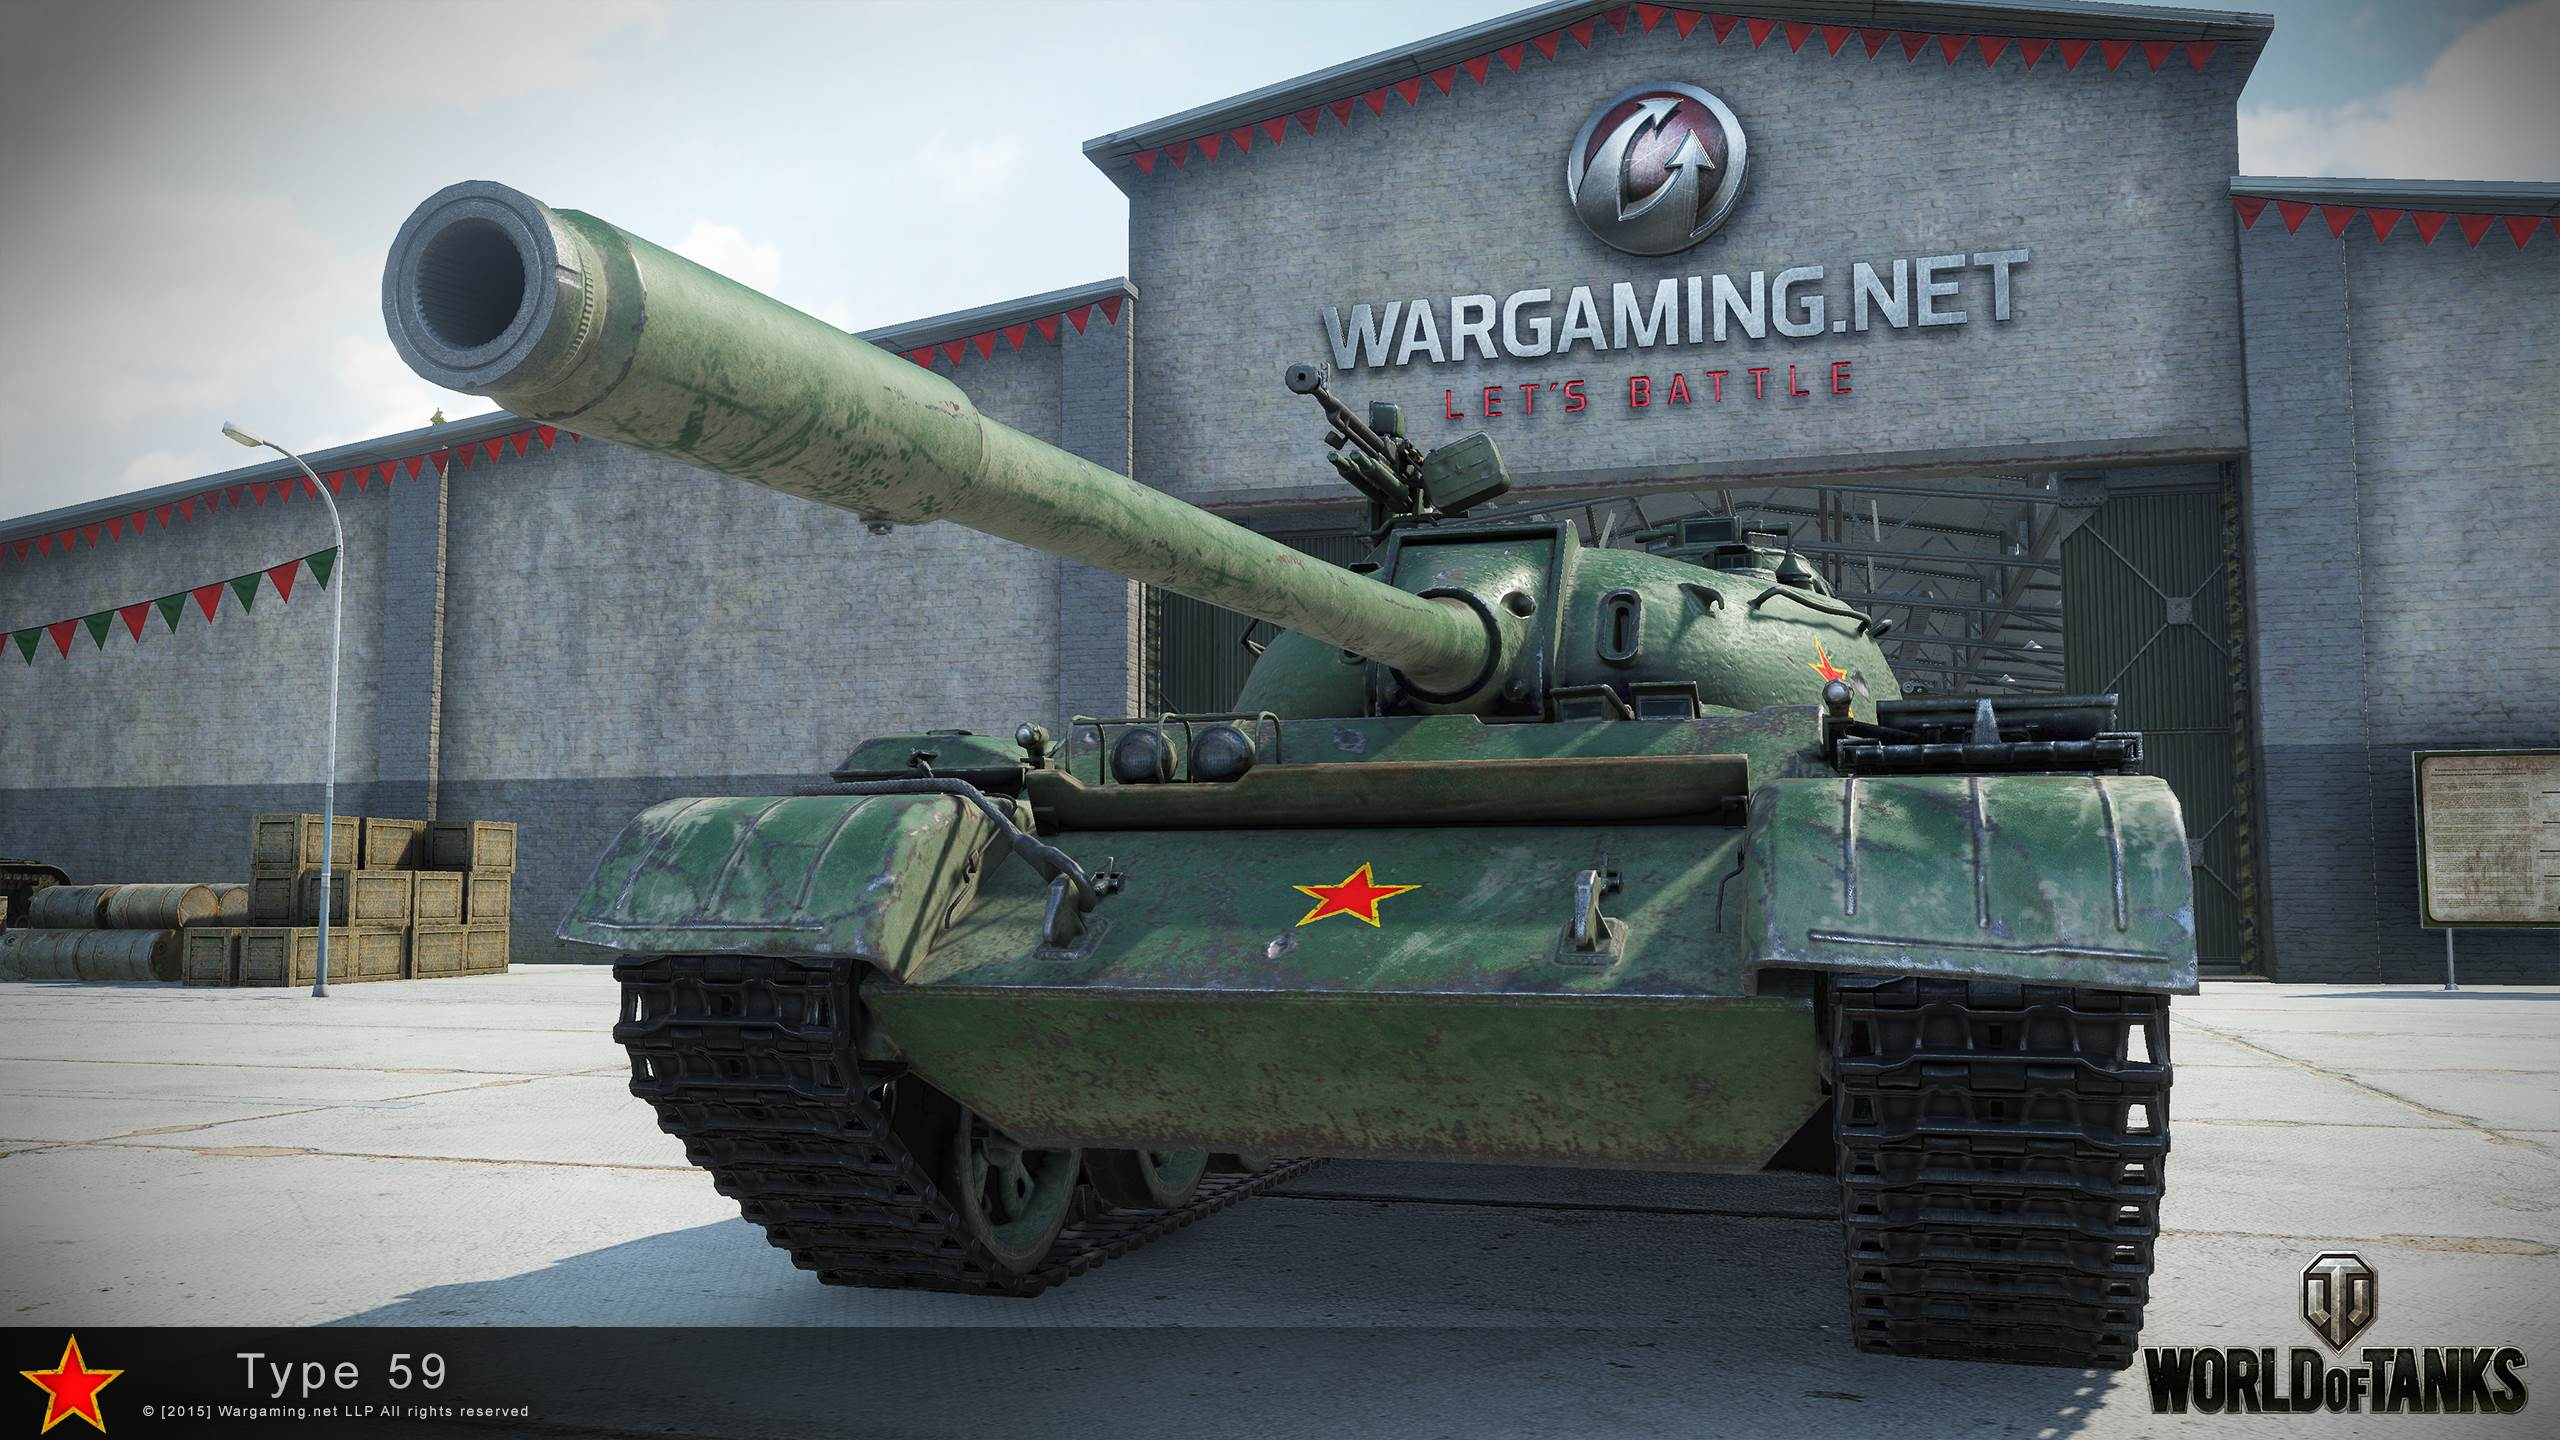 world of tanks hit zones guide » Моды Wargaming